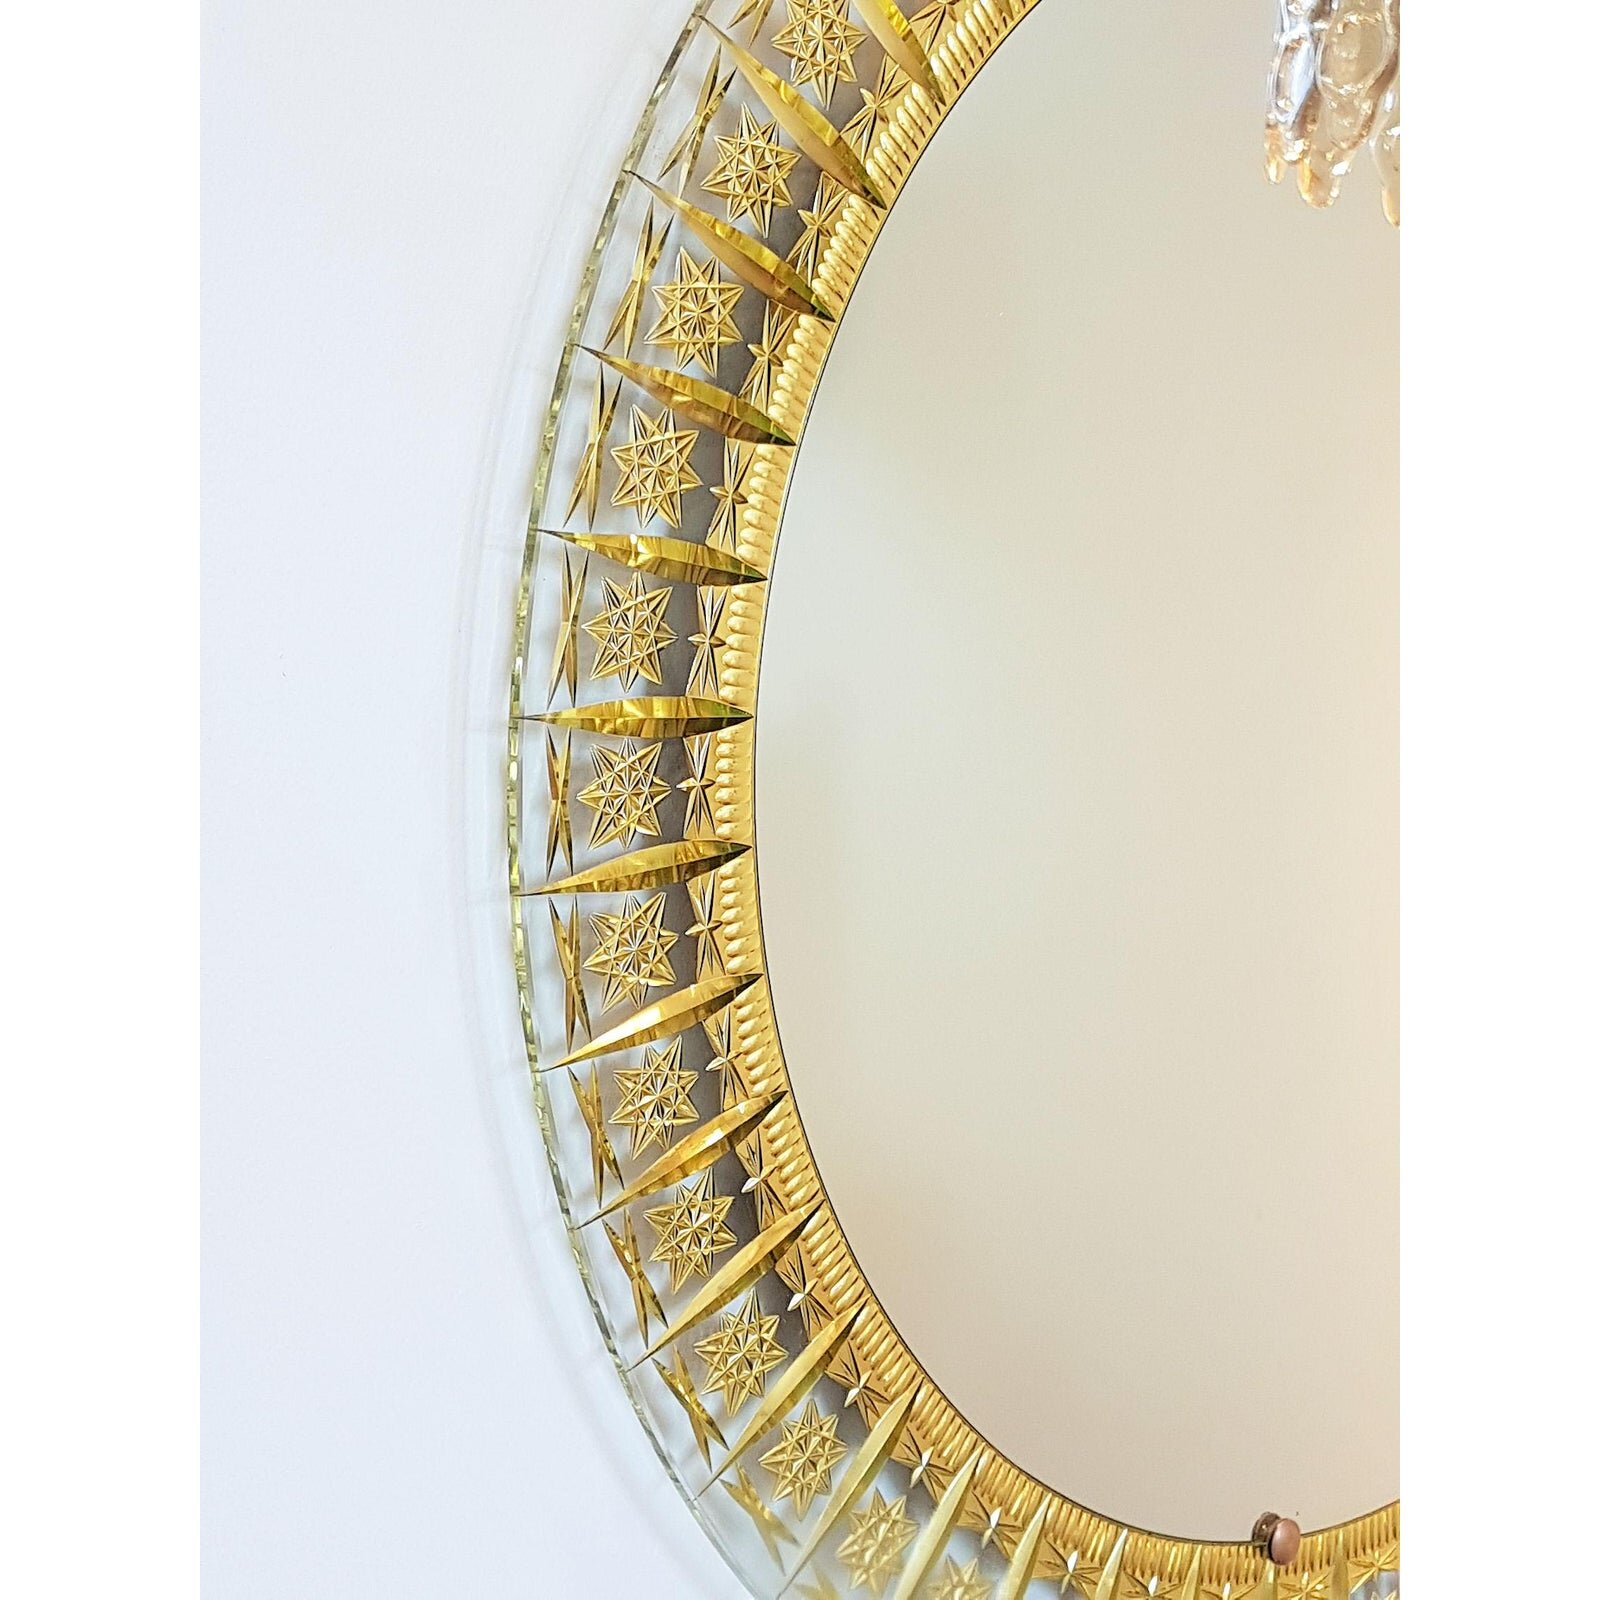 Vintage Cristal Arte All Glass Mirror With Gold Inclusions Boston Design Center